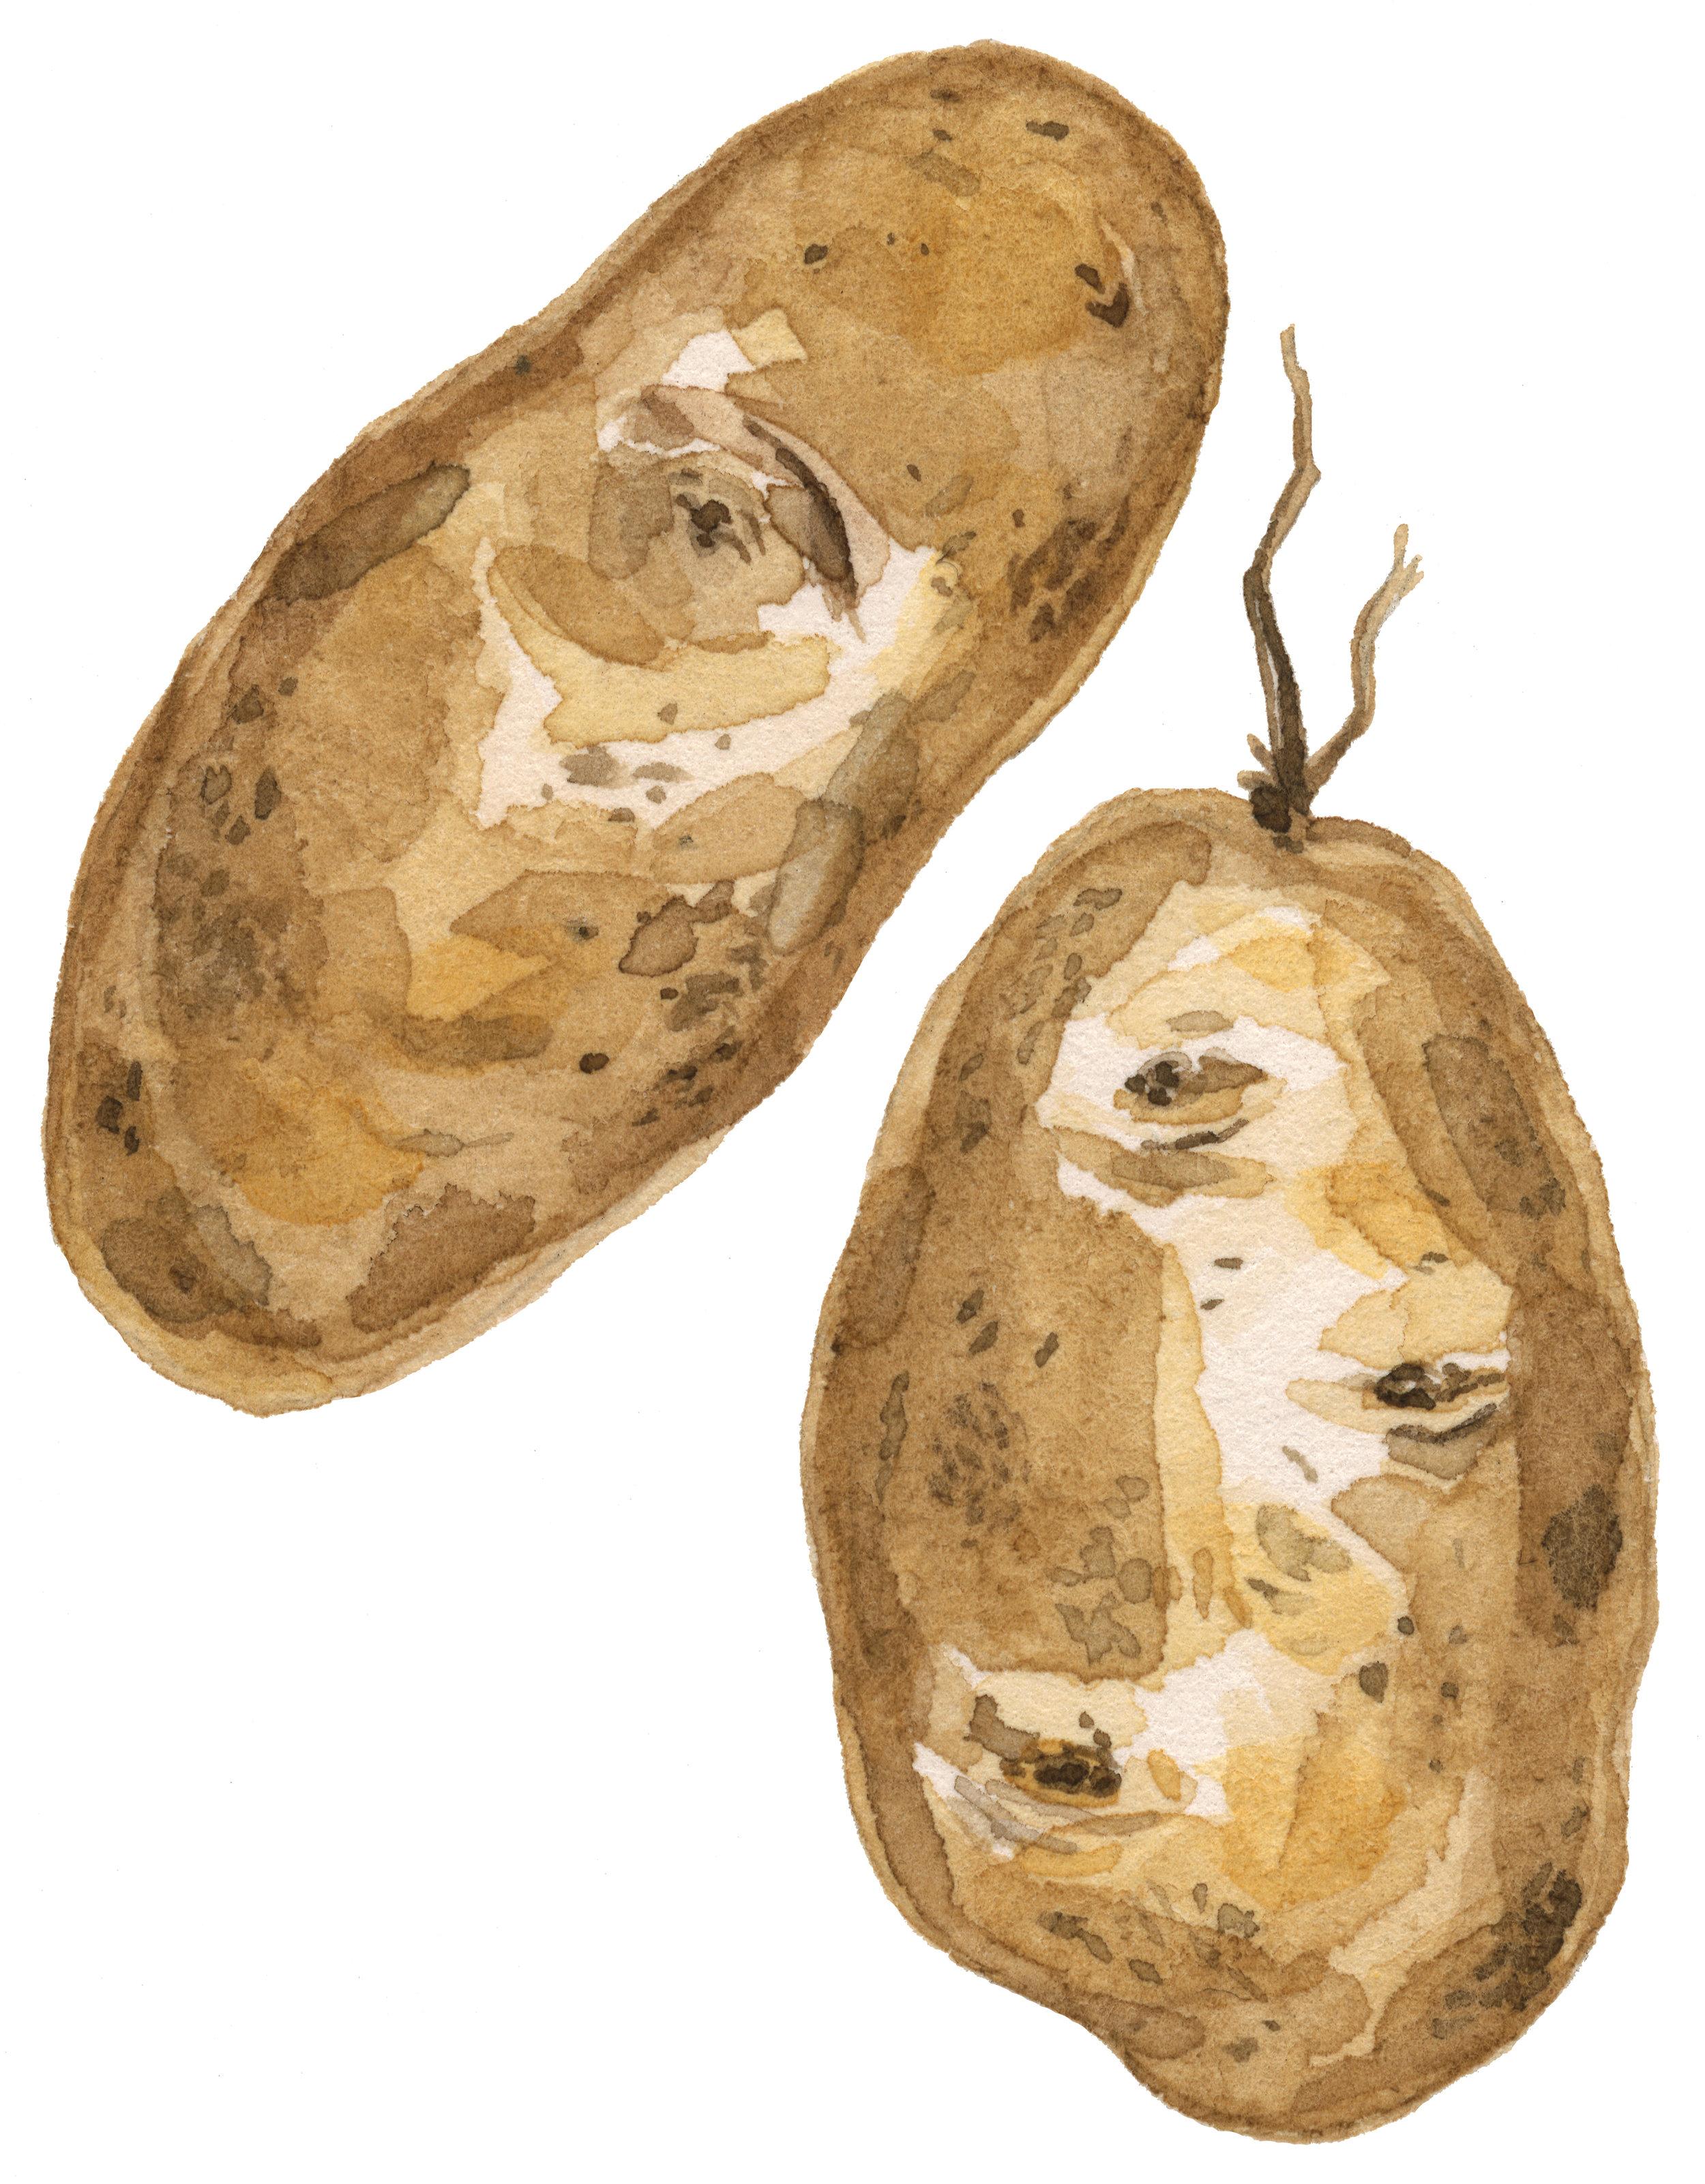 37-late-potatoes-lrg.jpg